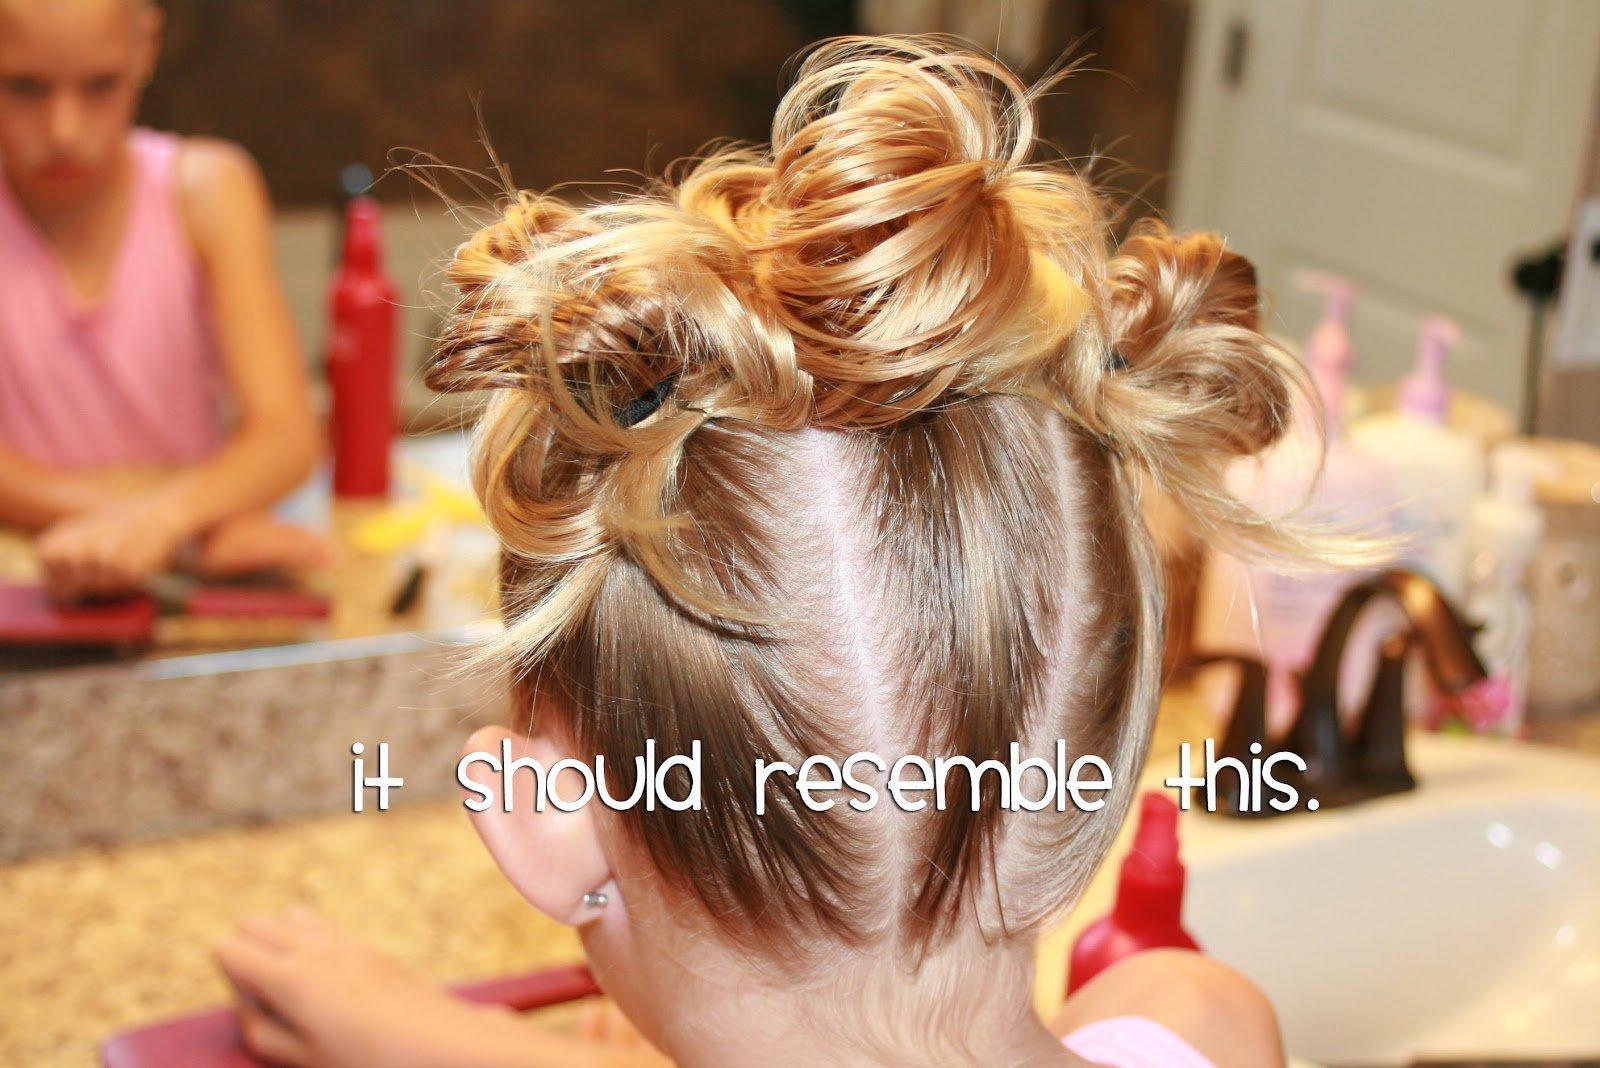 Astounding 25 Cute Little Girl Hairstyles Hairstyles For Women Draintrainus